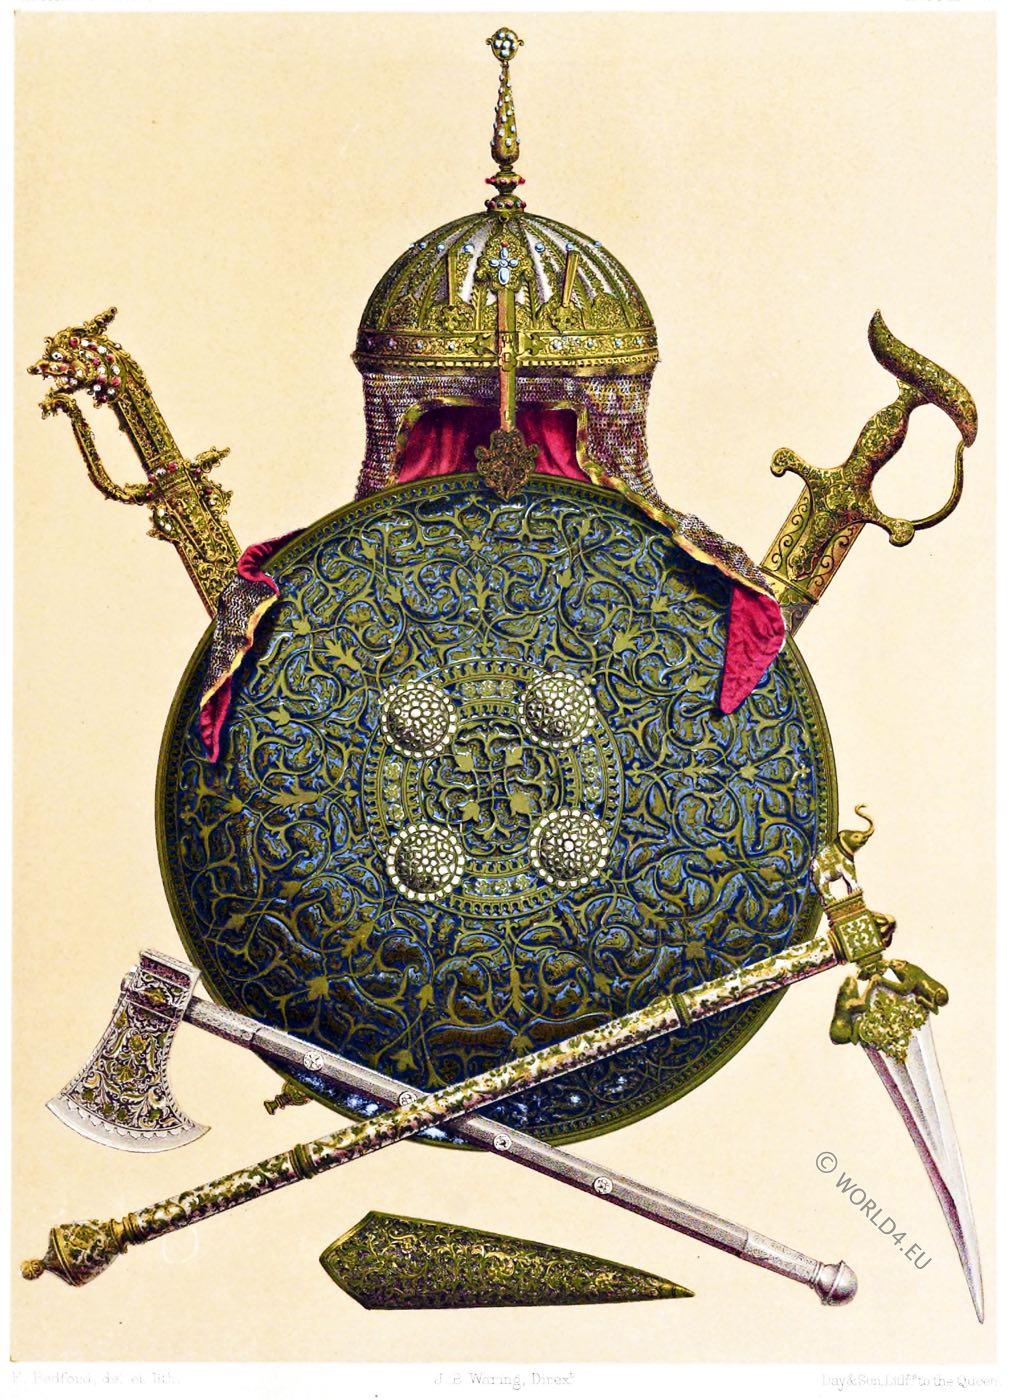 armor, weapons, Battle axe, Damascus steel,